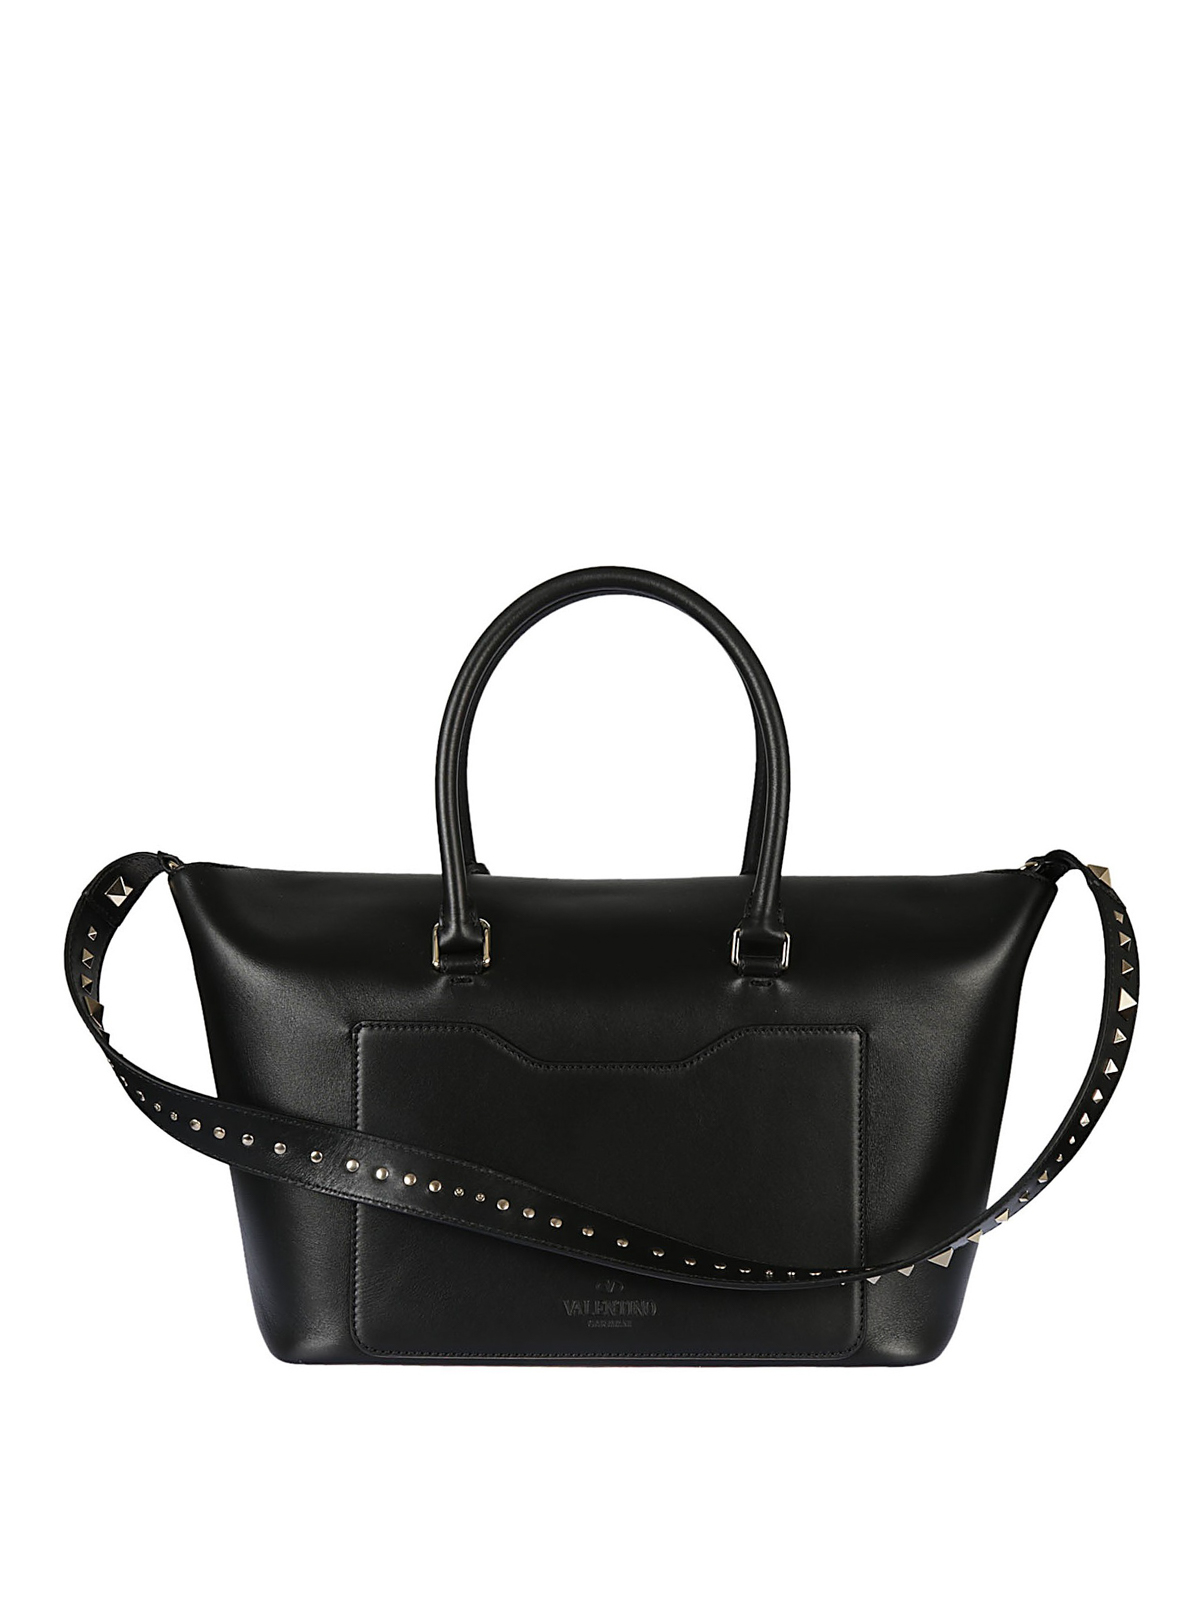 db3761c29b68 iKRIX VALENTINO GARAVANI  bowling bags - Demilune black leather satchel